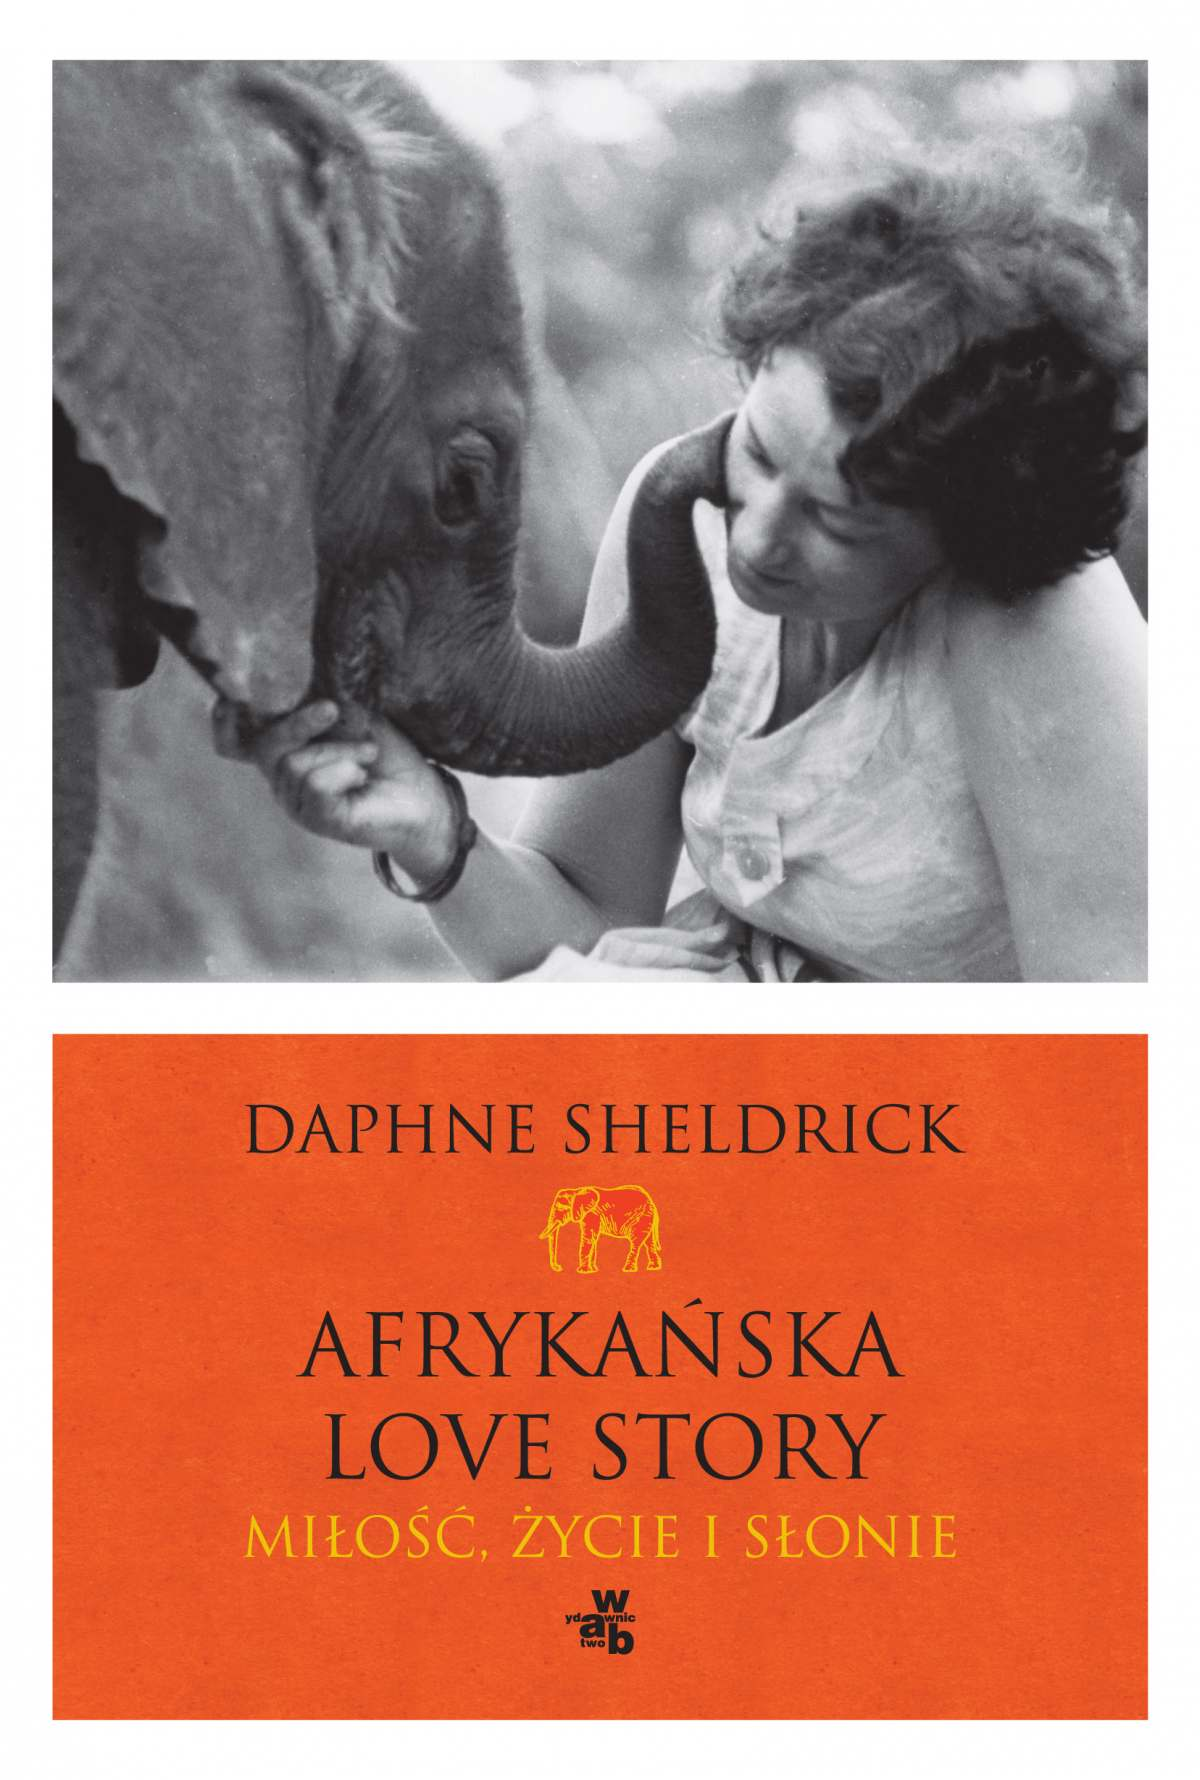 Afrykańska love story - Ebook (Książka EPUB) do pobrania w formacie EPUB